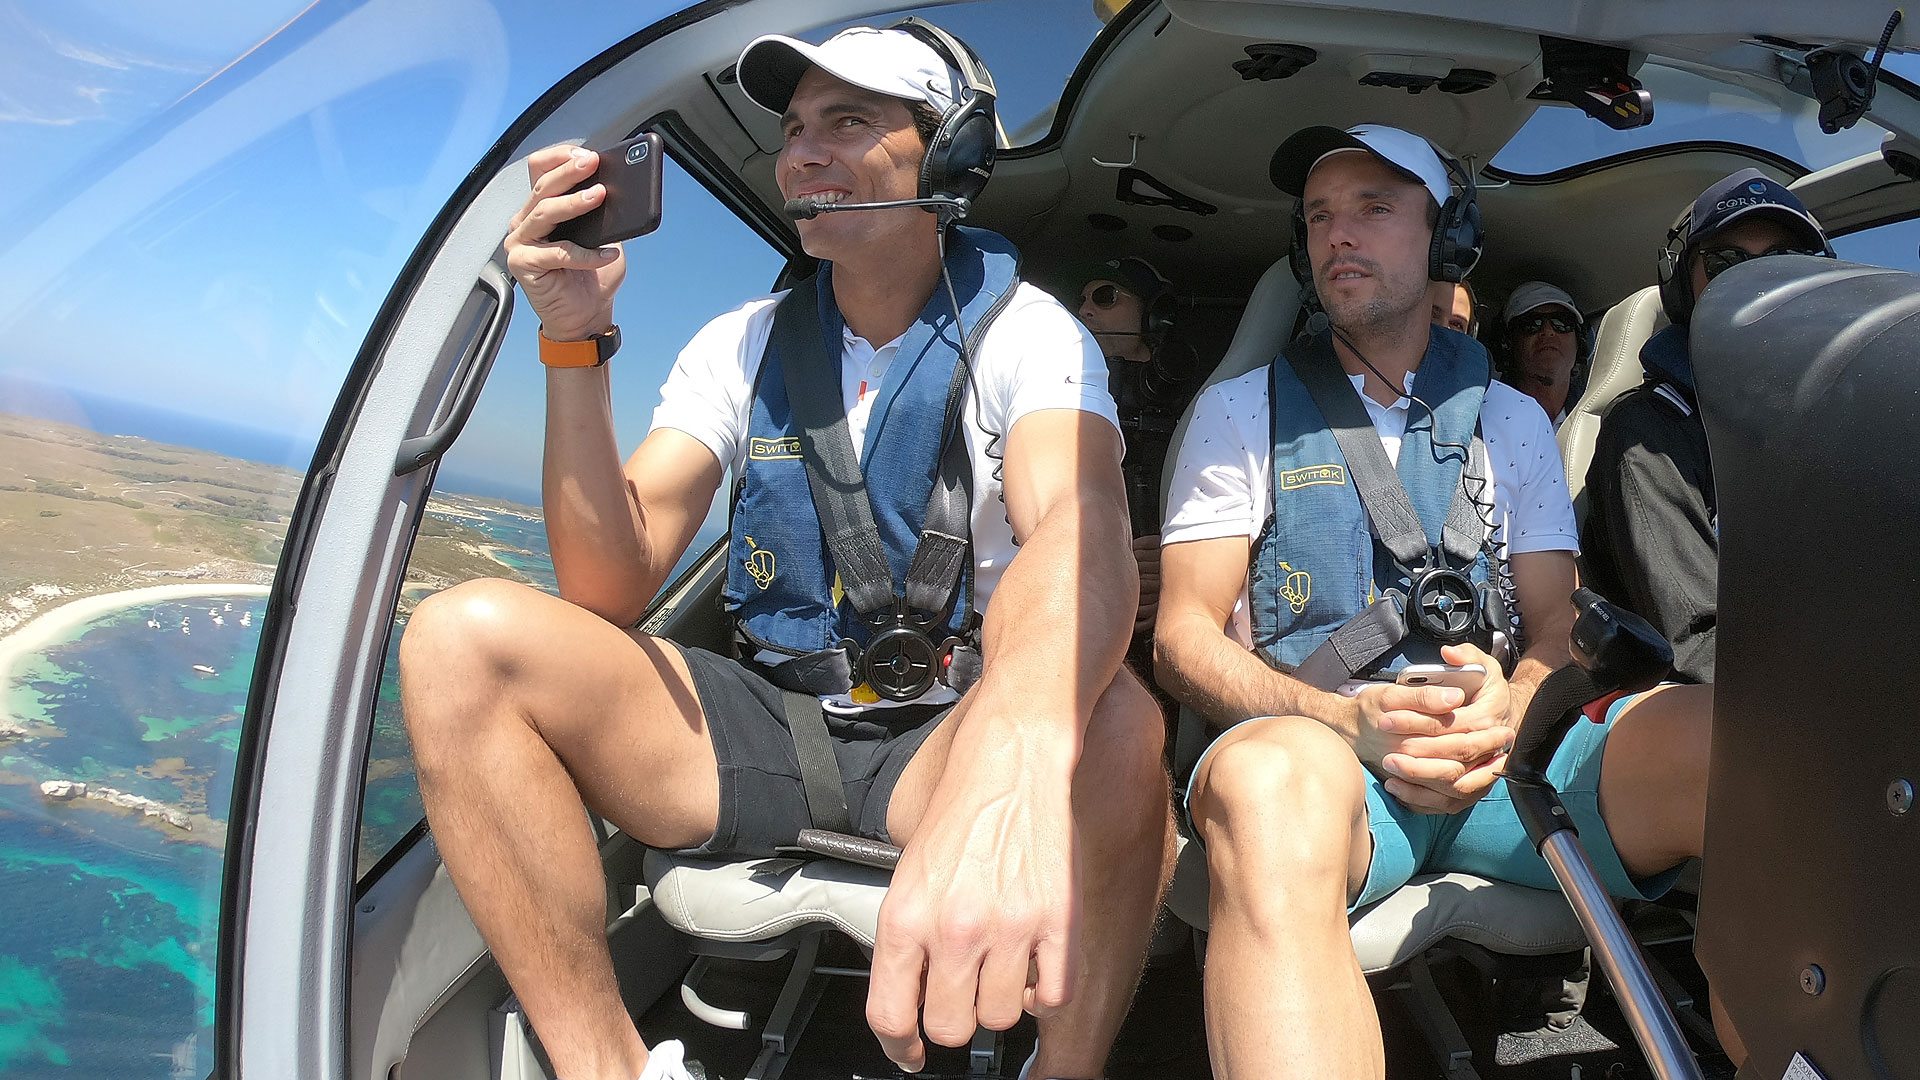 Nadal, Bautista Agut en route to Rottnest Island